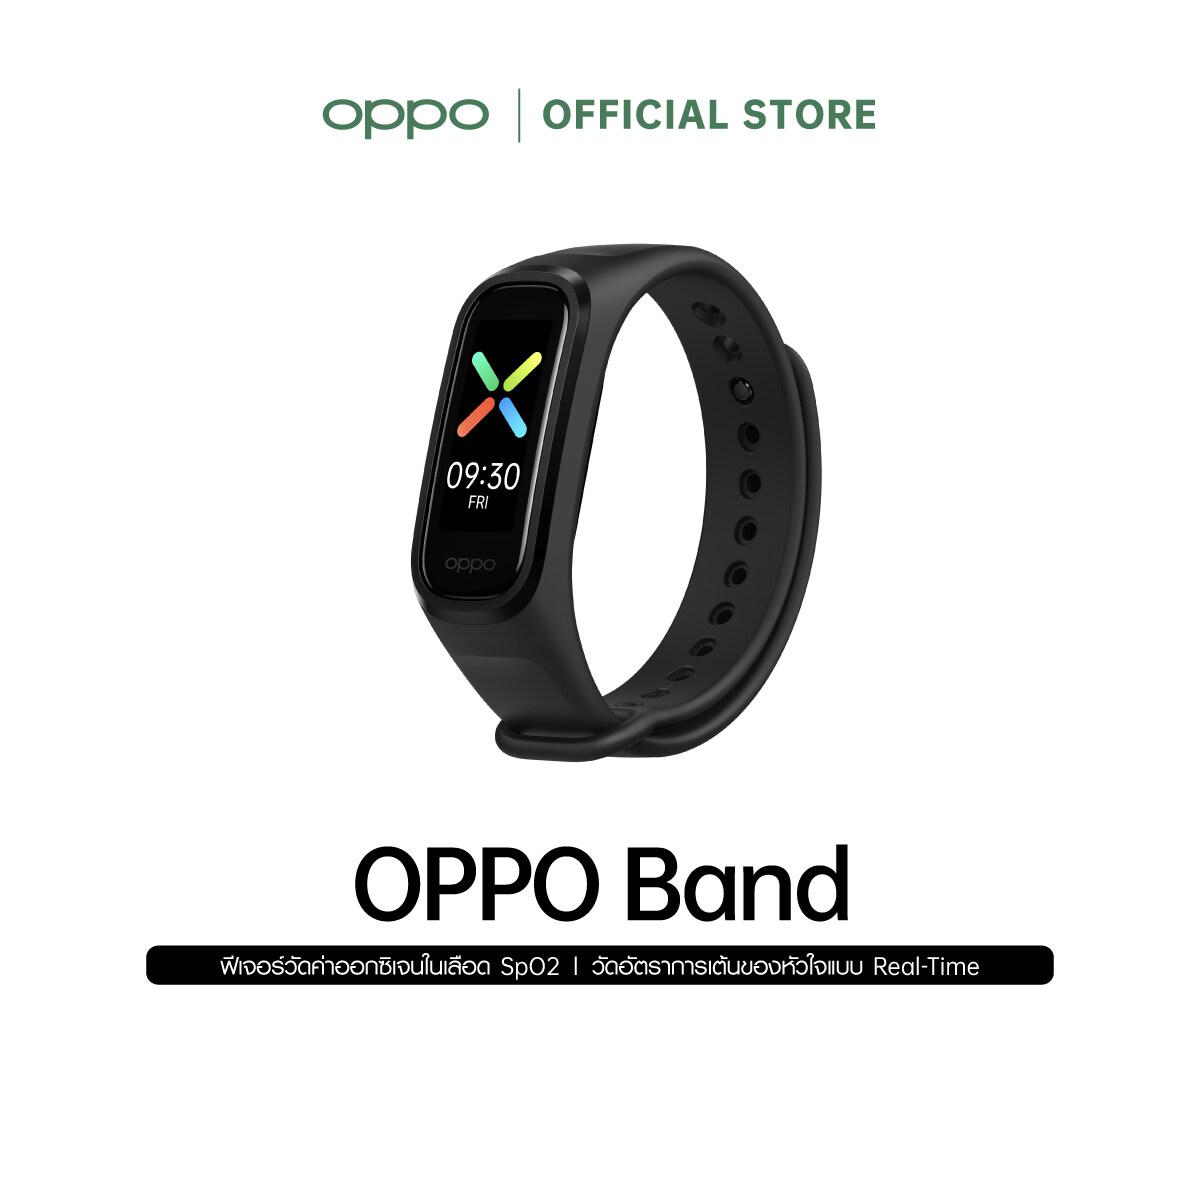 [new] Oppo Band สายรัดข้อมืออัจฉริยะ หน้าจอ 1.1 นิ้ว 16 Mb รับประกัน 12 เดือน.